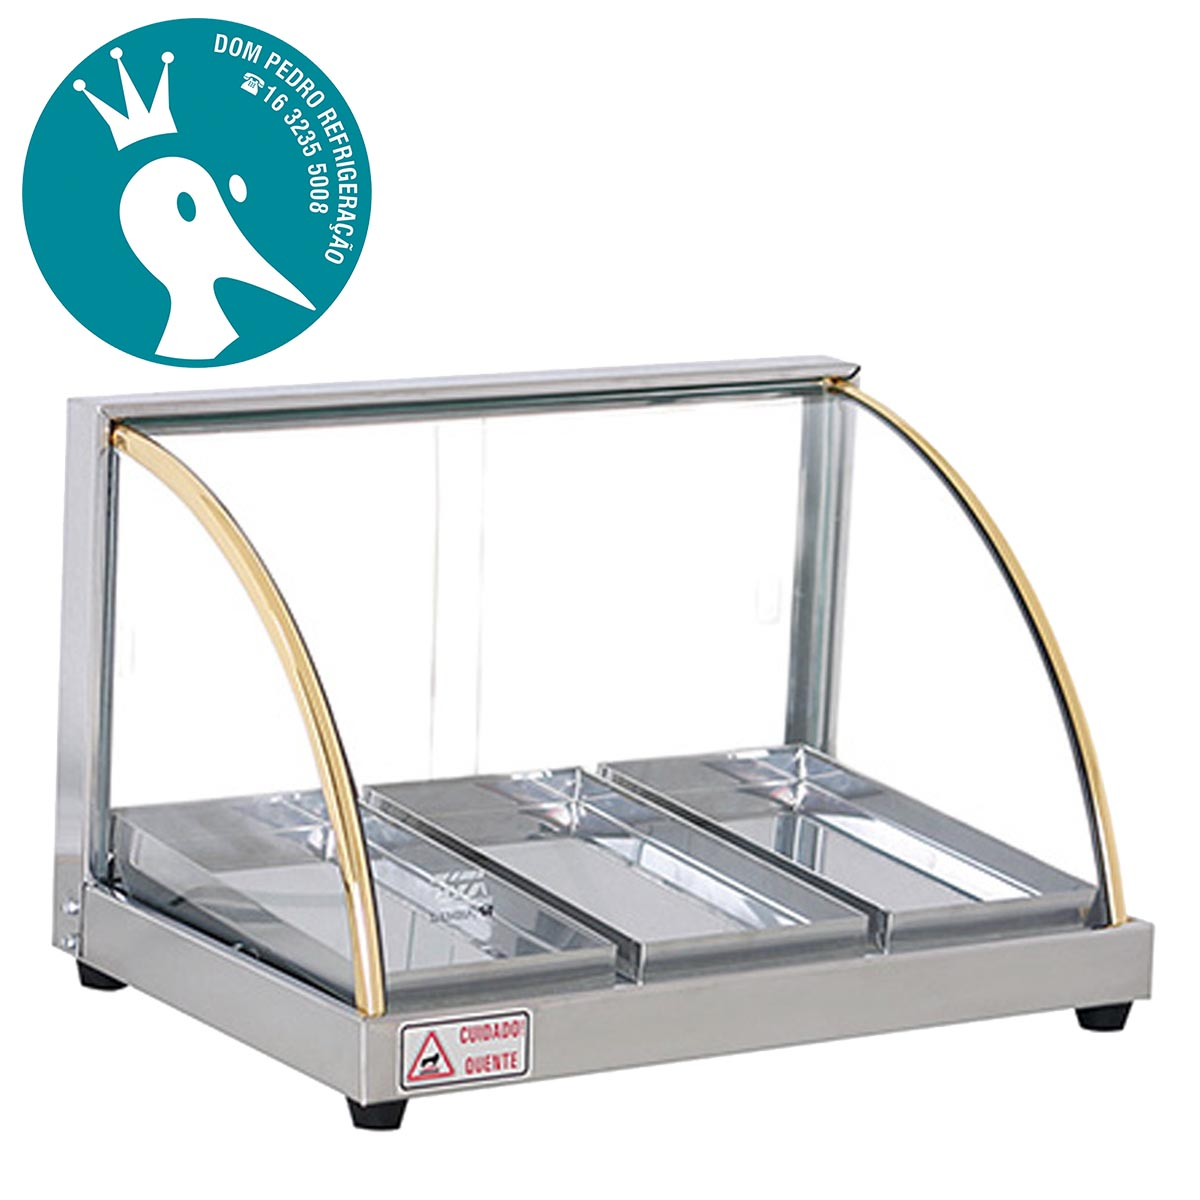 Estufa para Salgados Vidro Curvo 3 Bandejas W3B Titã